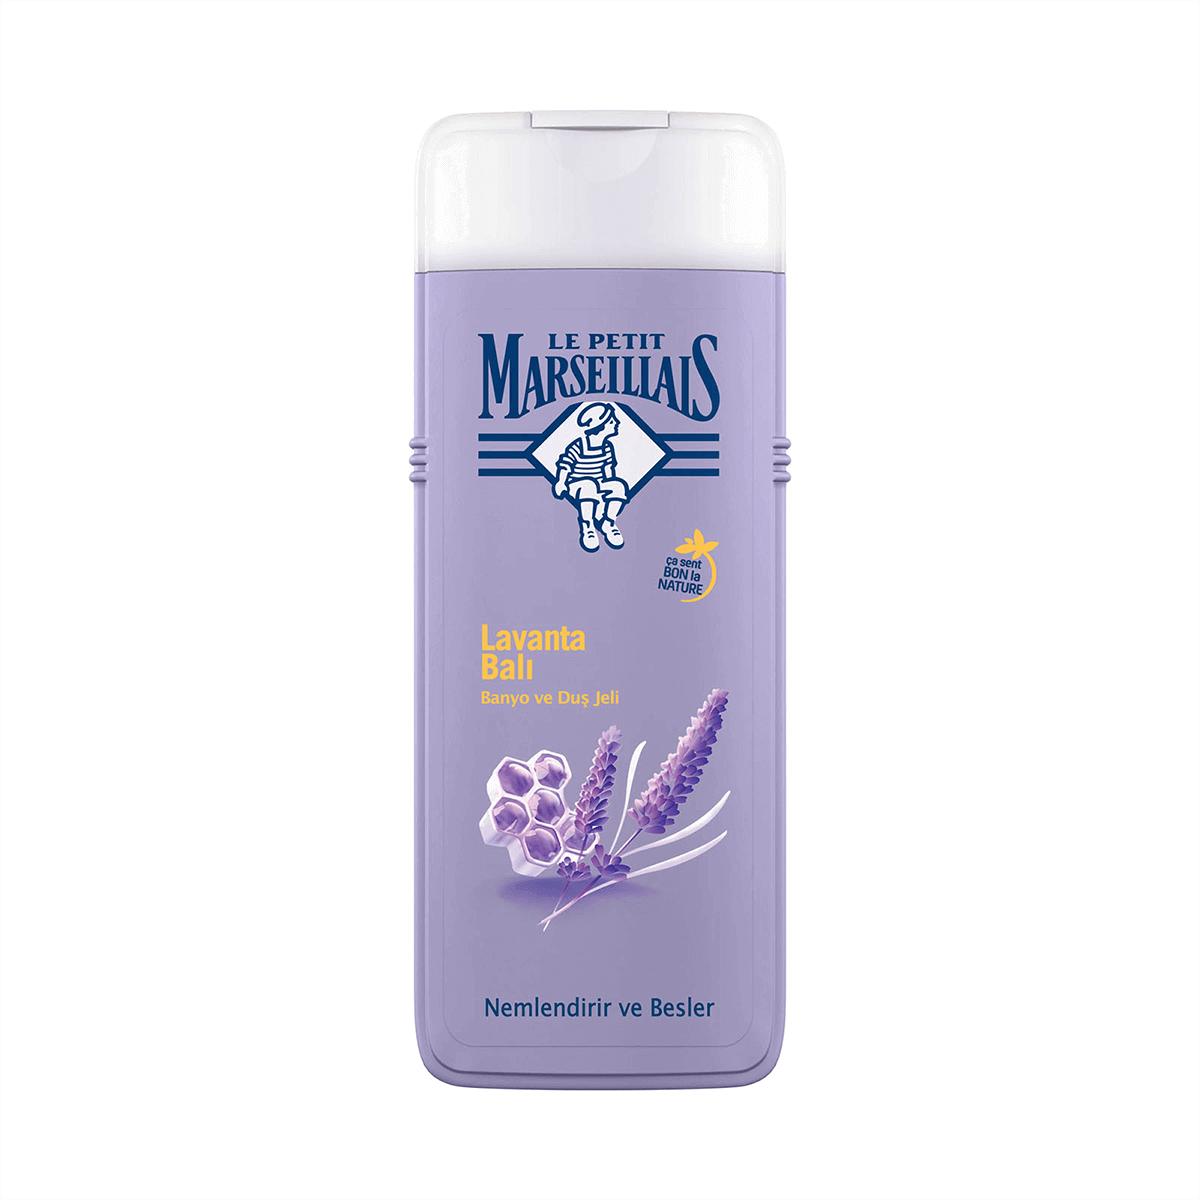 Le Petit Marselliais Lavanta Balı Banyo ve Duş Jeli 400 Ml